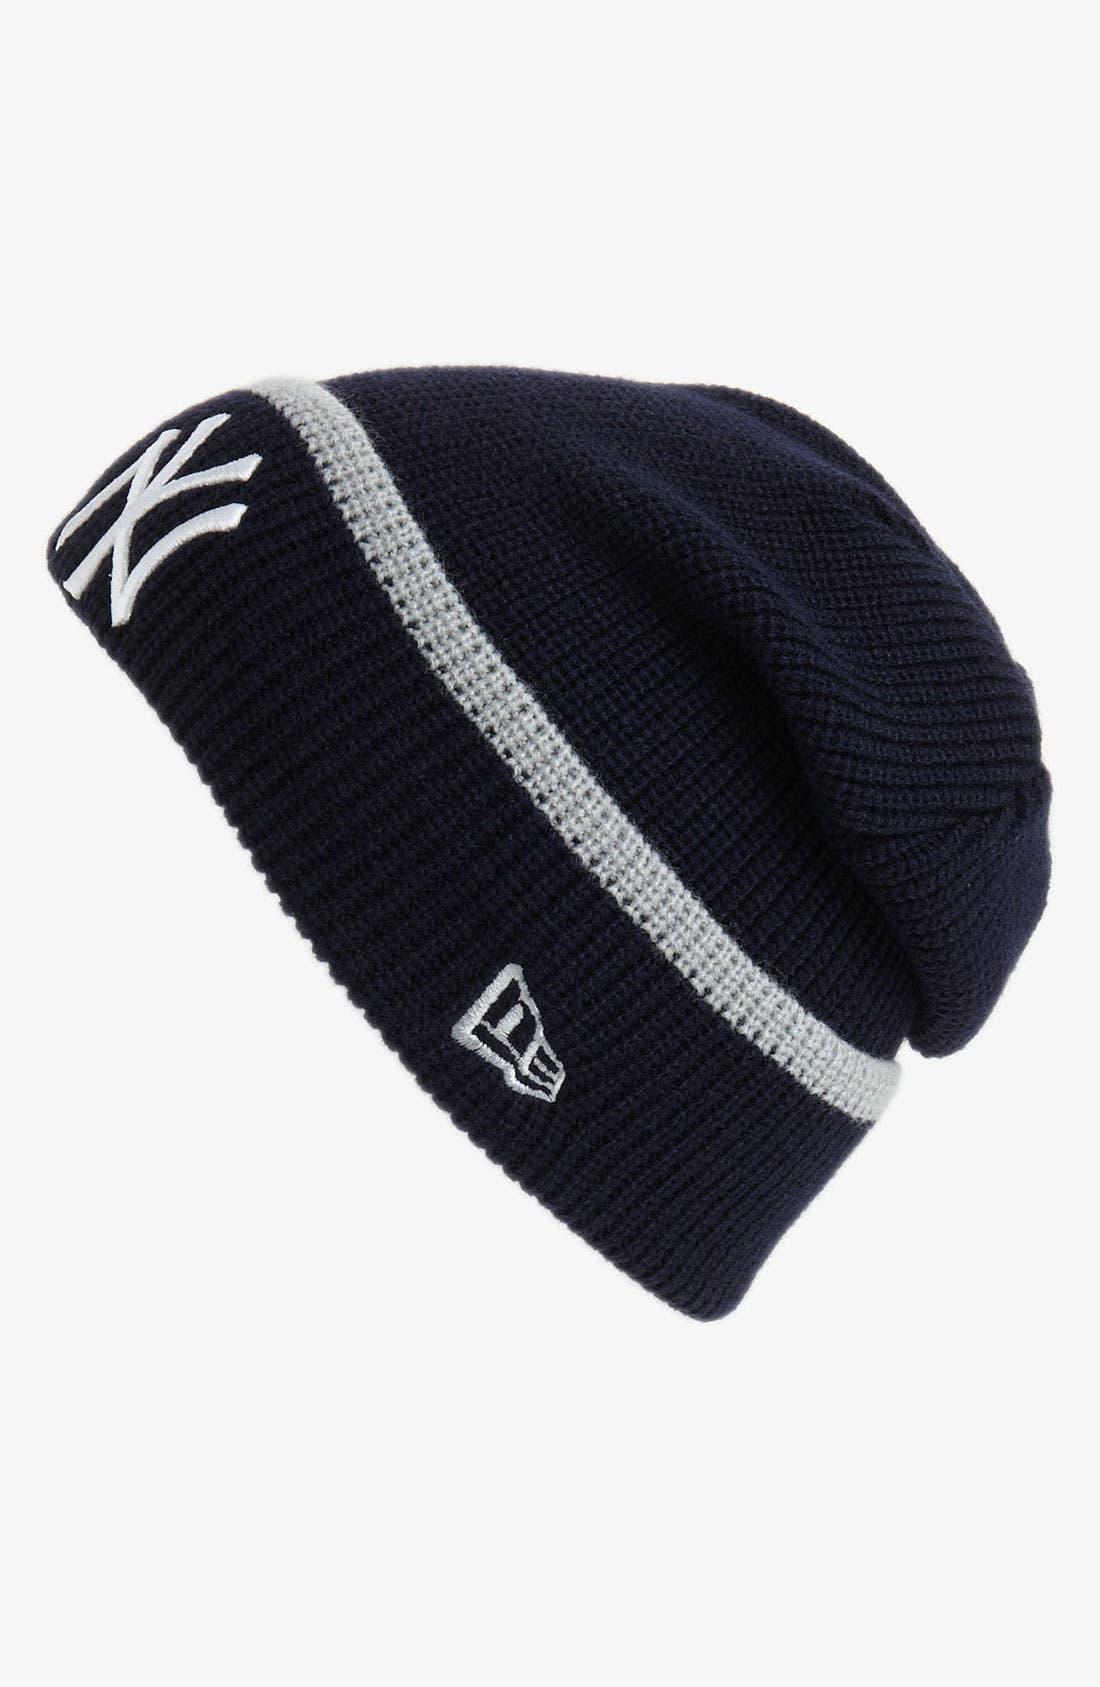 Main Image - New Era Cap 'New York Yankees' Pop-Cuff Knit Beanie